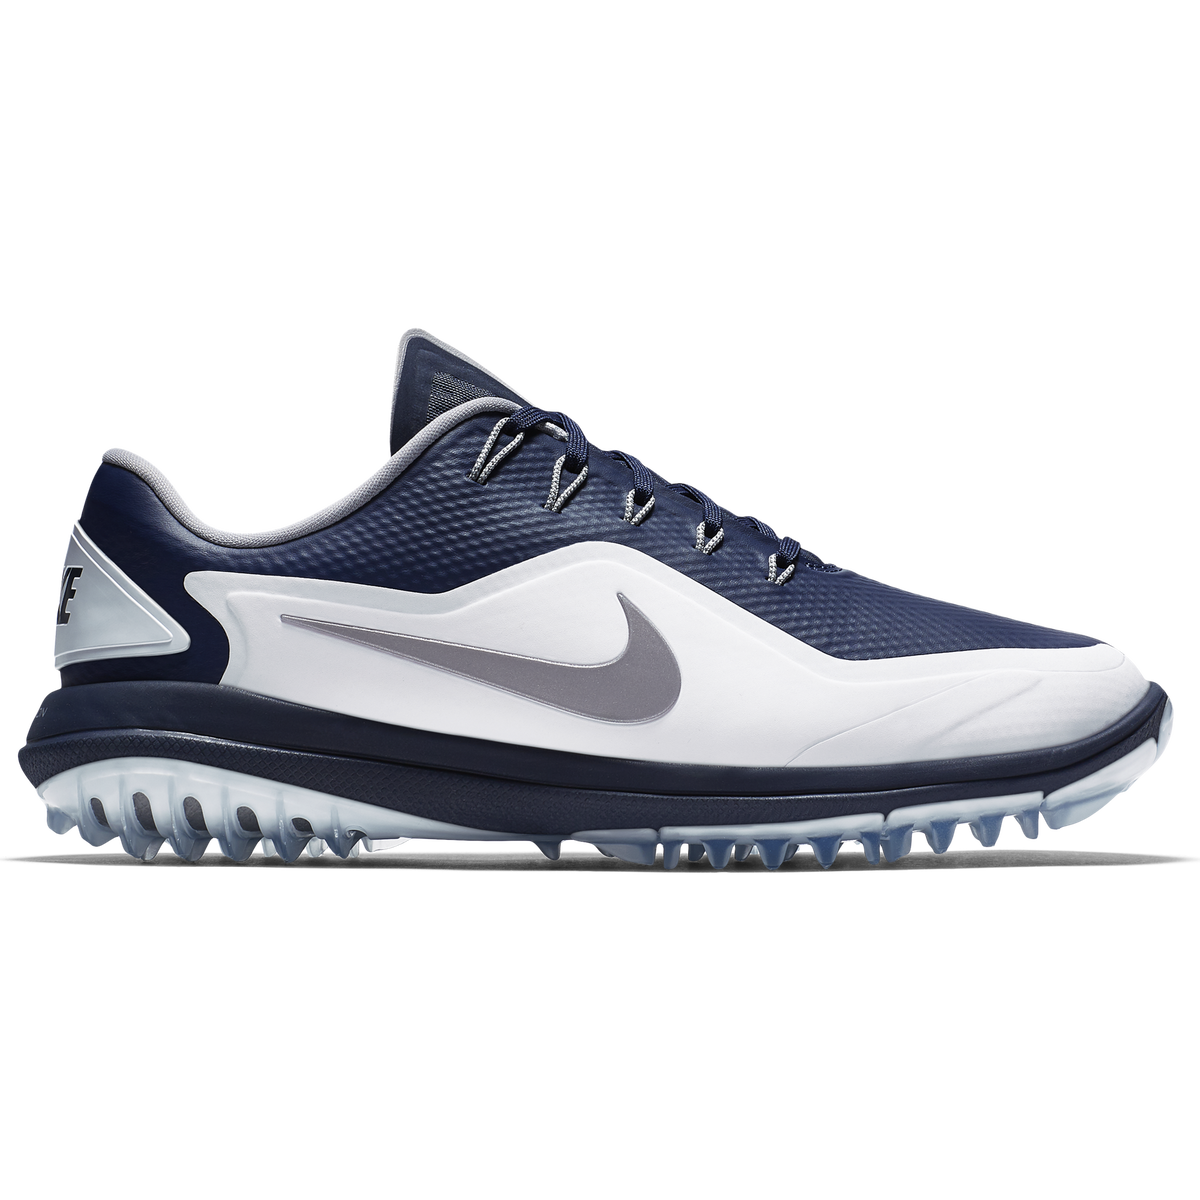 Nike Lunar Control Vapor 2 Men s Golf Shoe - Blue White e9803d60454